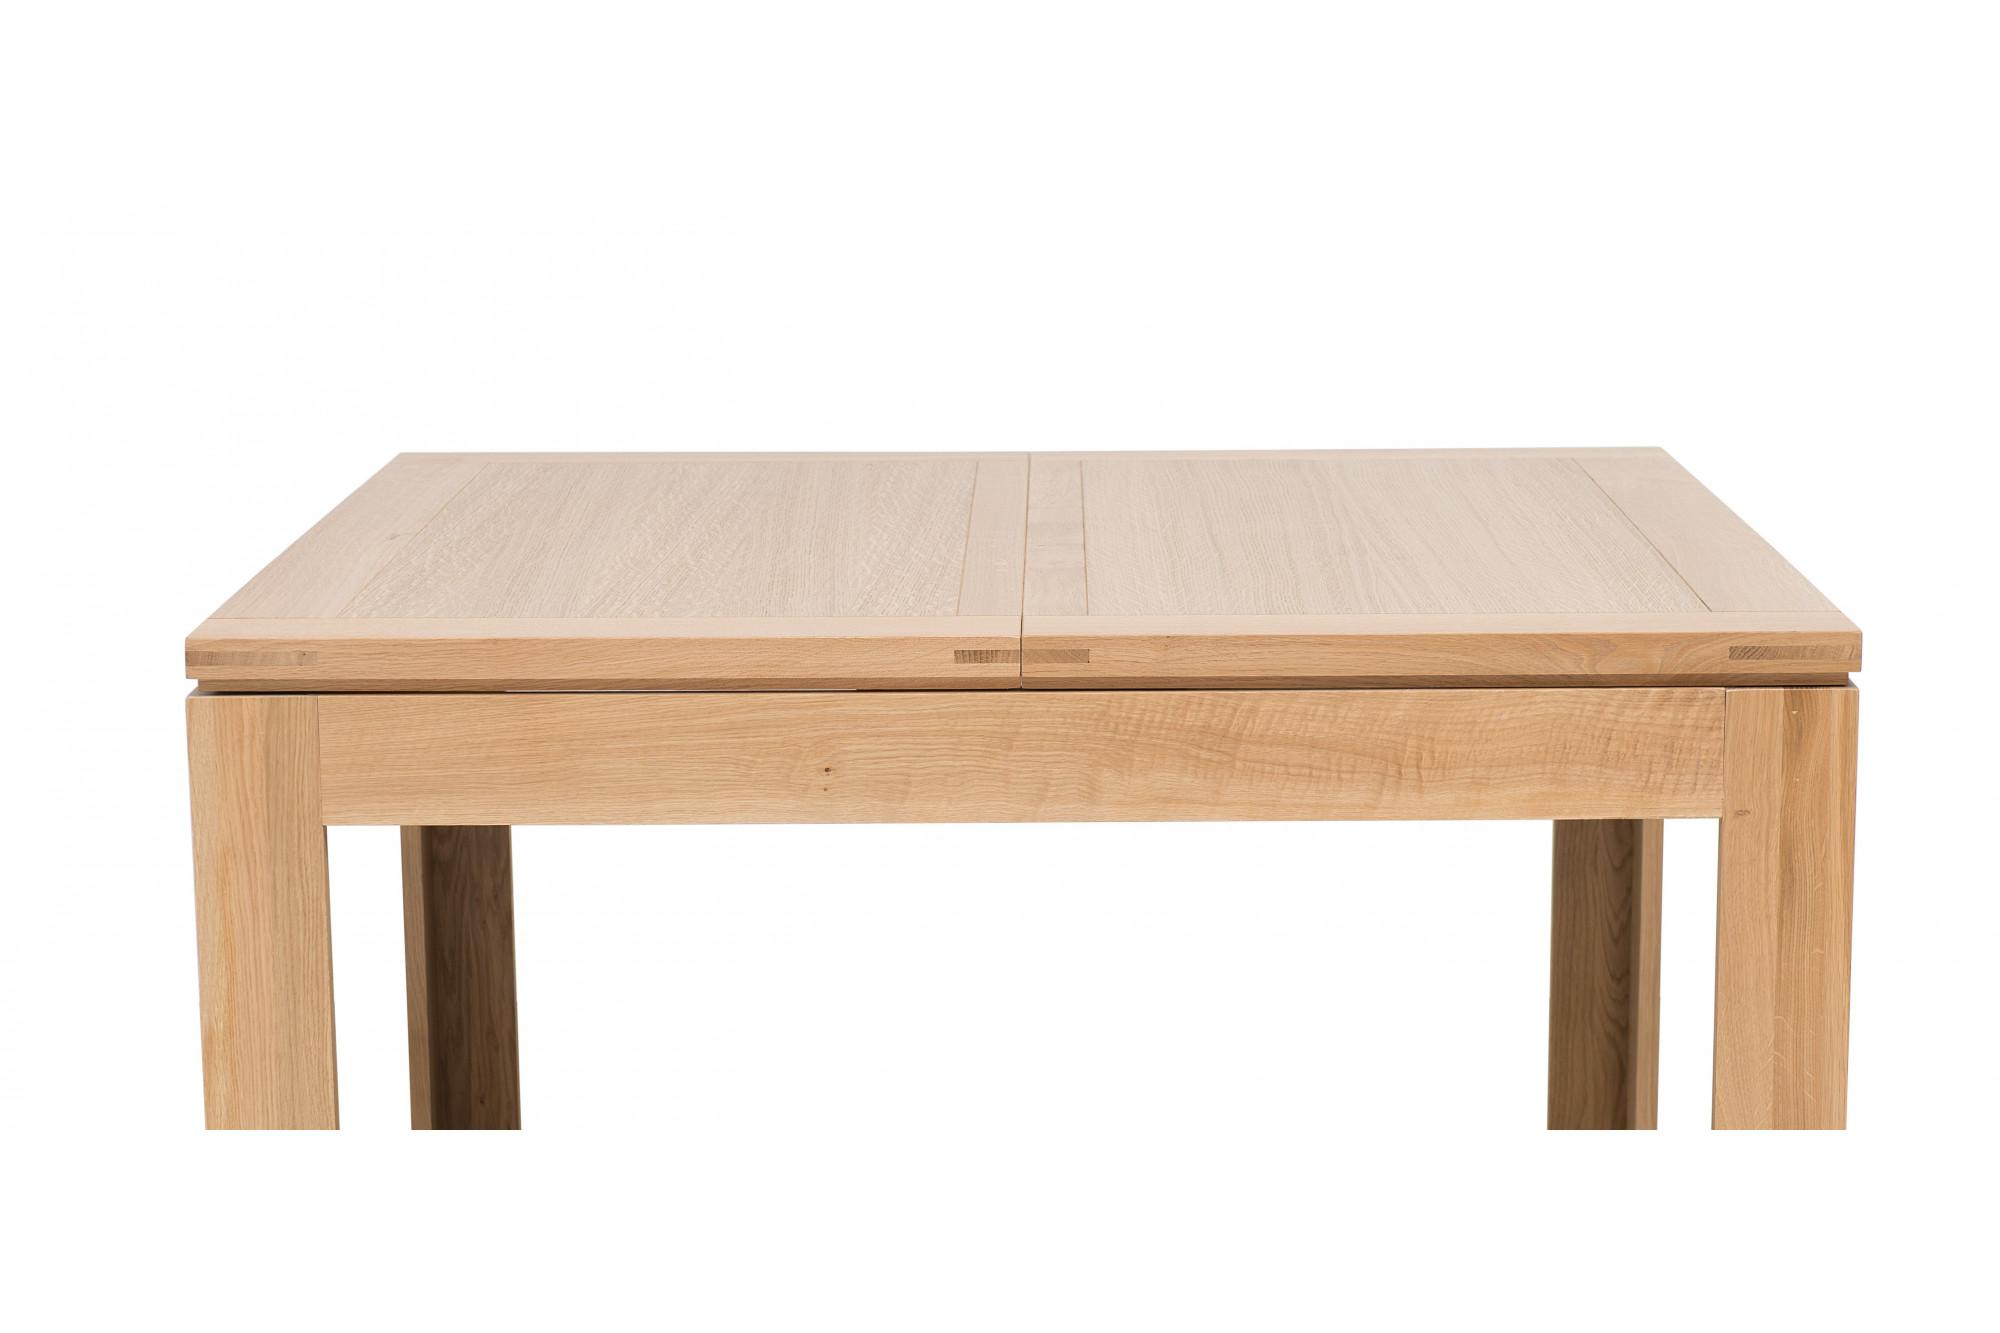 Table En Bois Chene Clair chêne chêne boston en table carrée clair manger à f7yybvg6